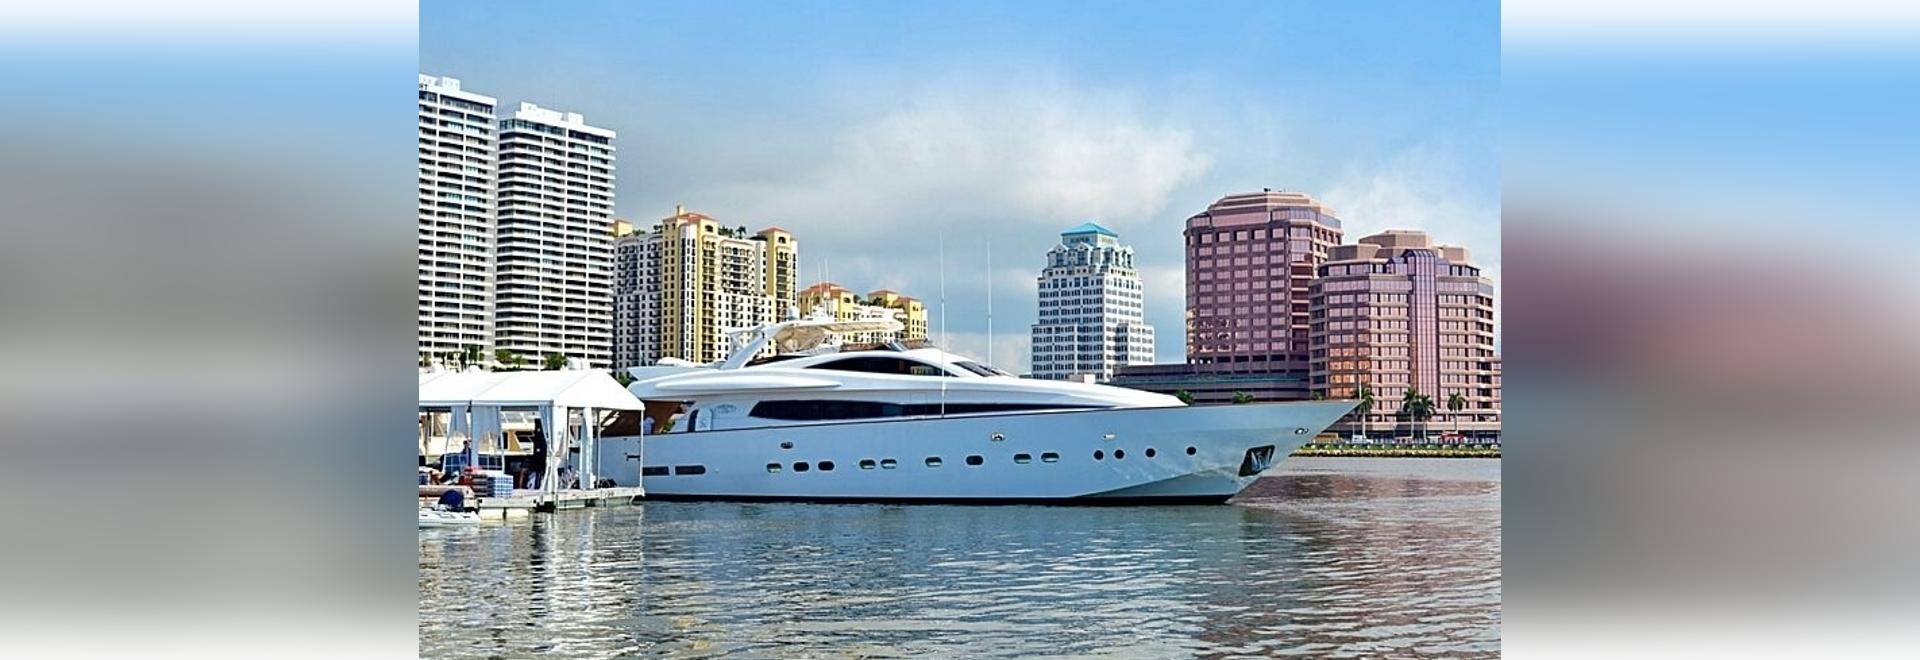 34m Antago yacht Caro Henri cerca un nuovo proprietario